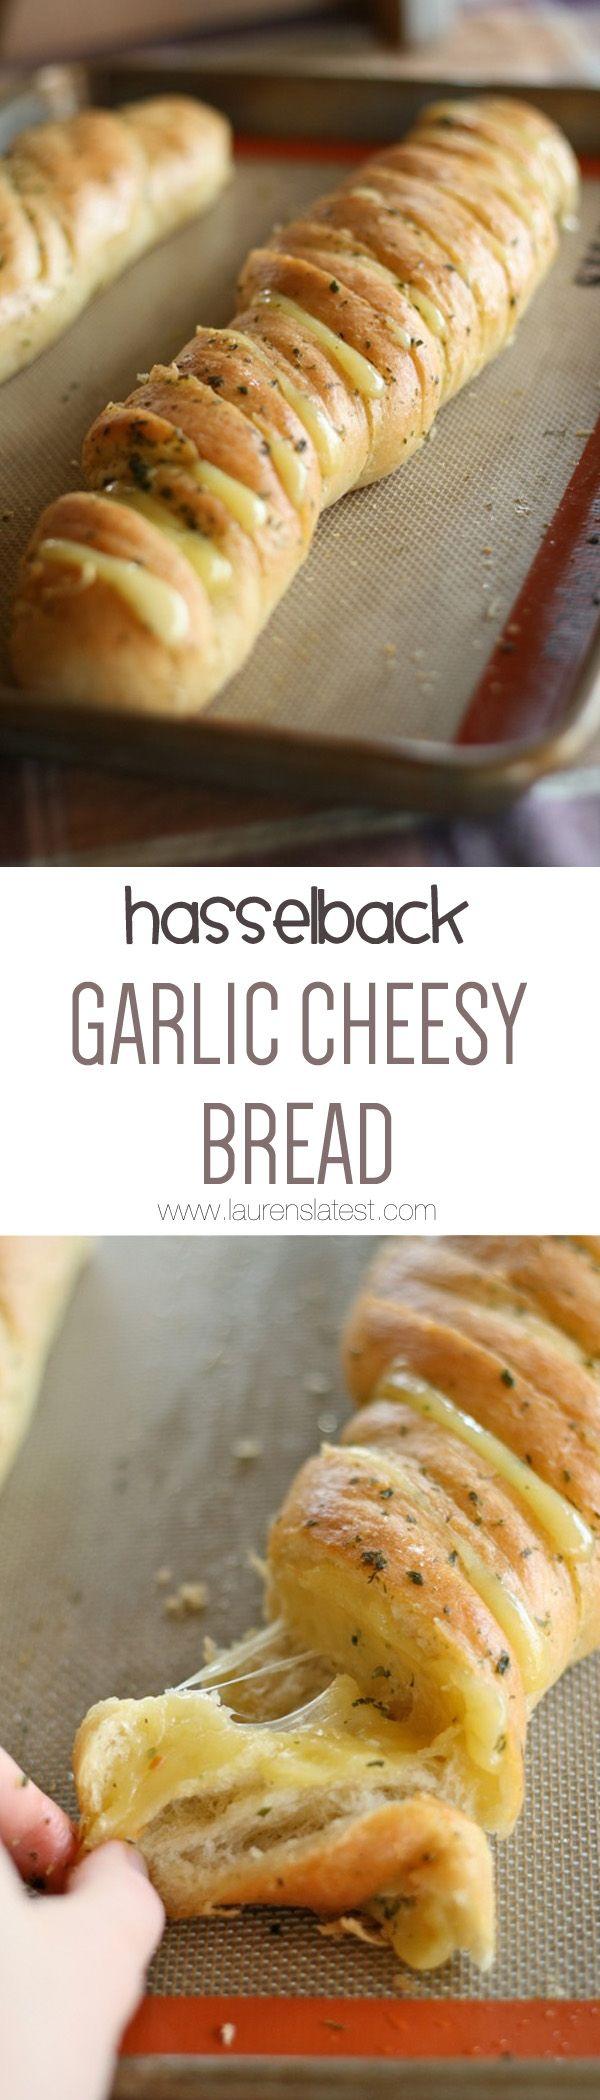 Hasselback Garlic Cheesy Bread!